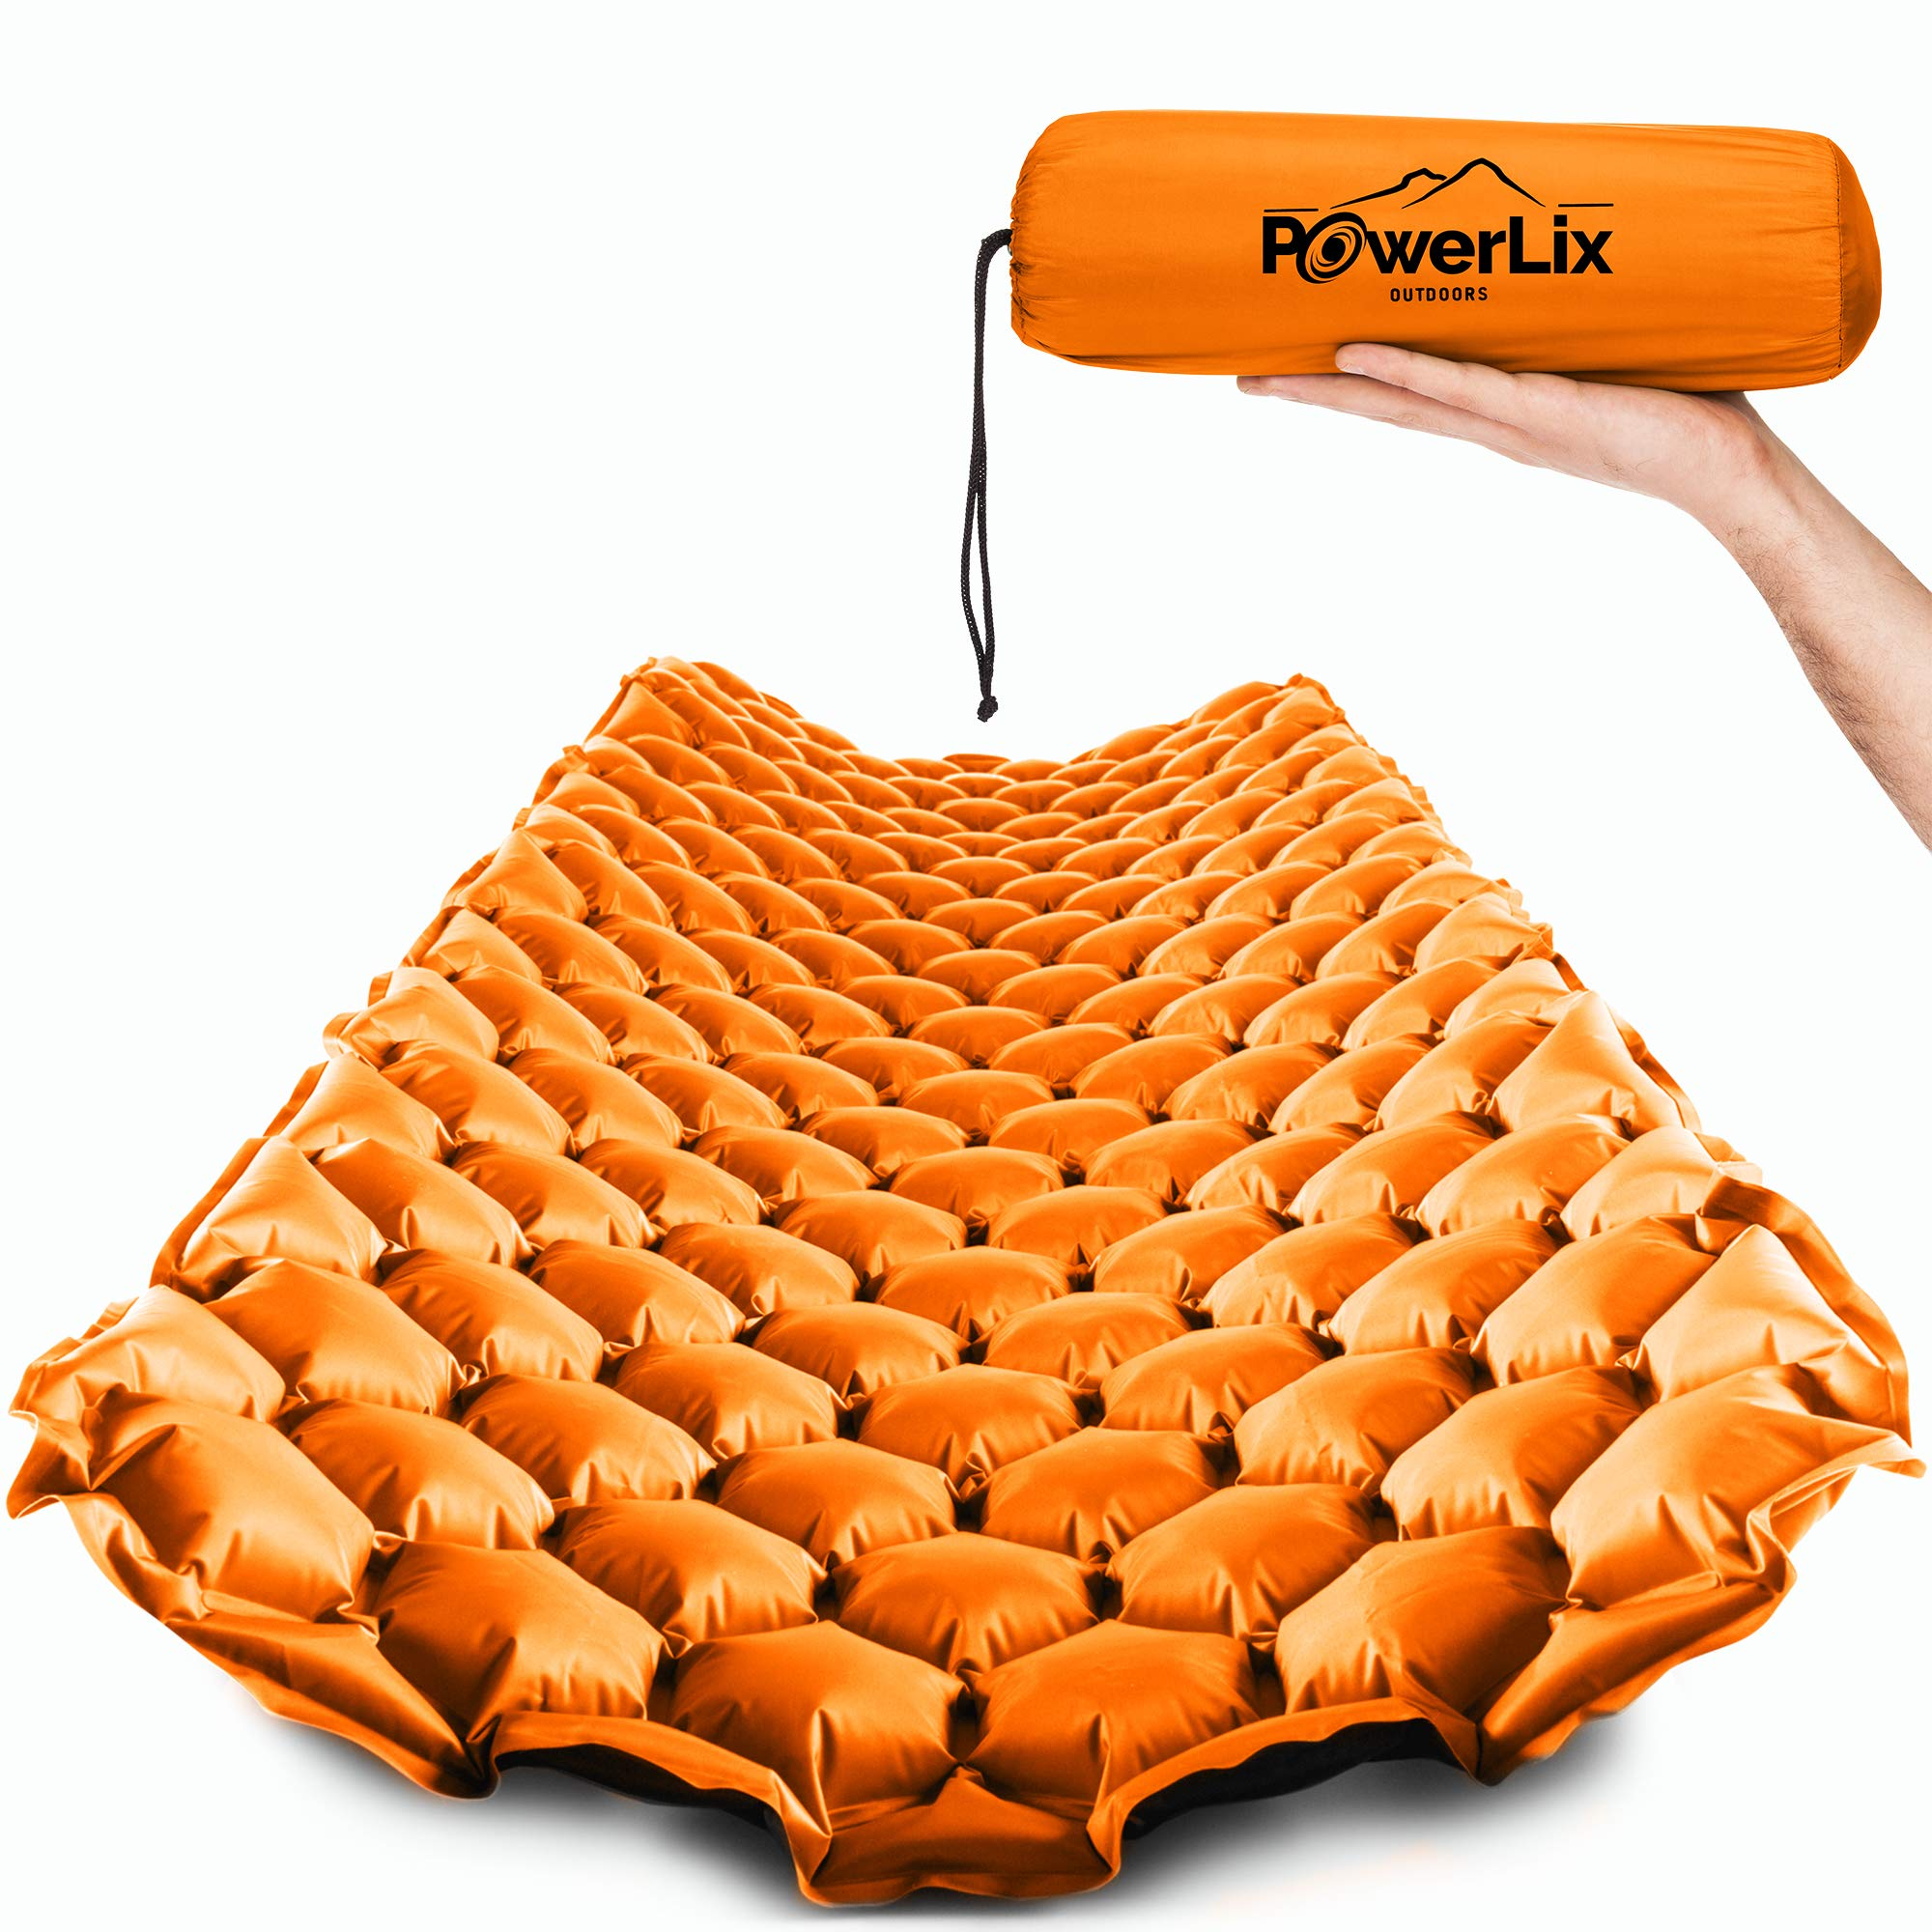 PowerLix Sleeping Pad Orange Black